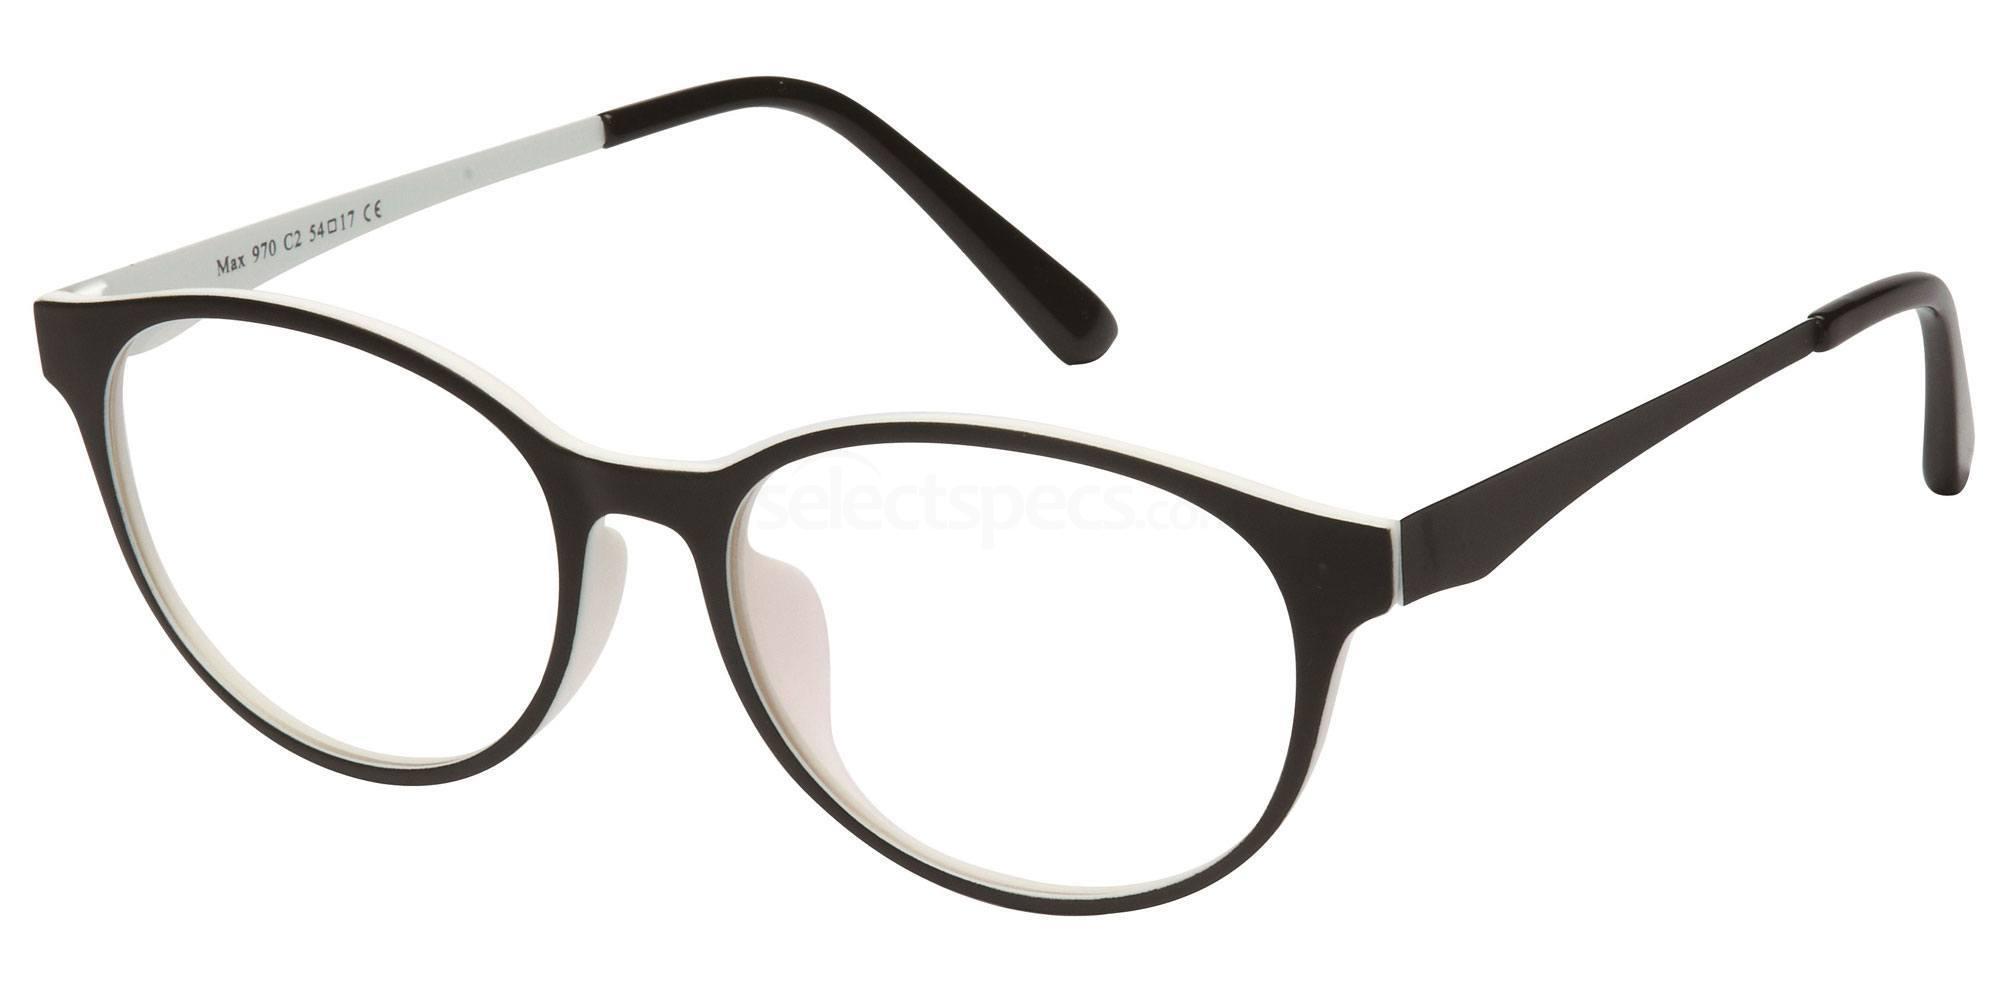 C2 M970 Glasses, Max Eyewear